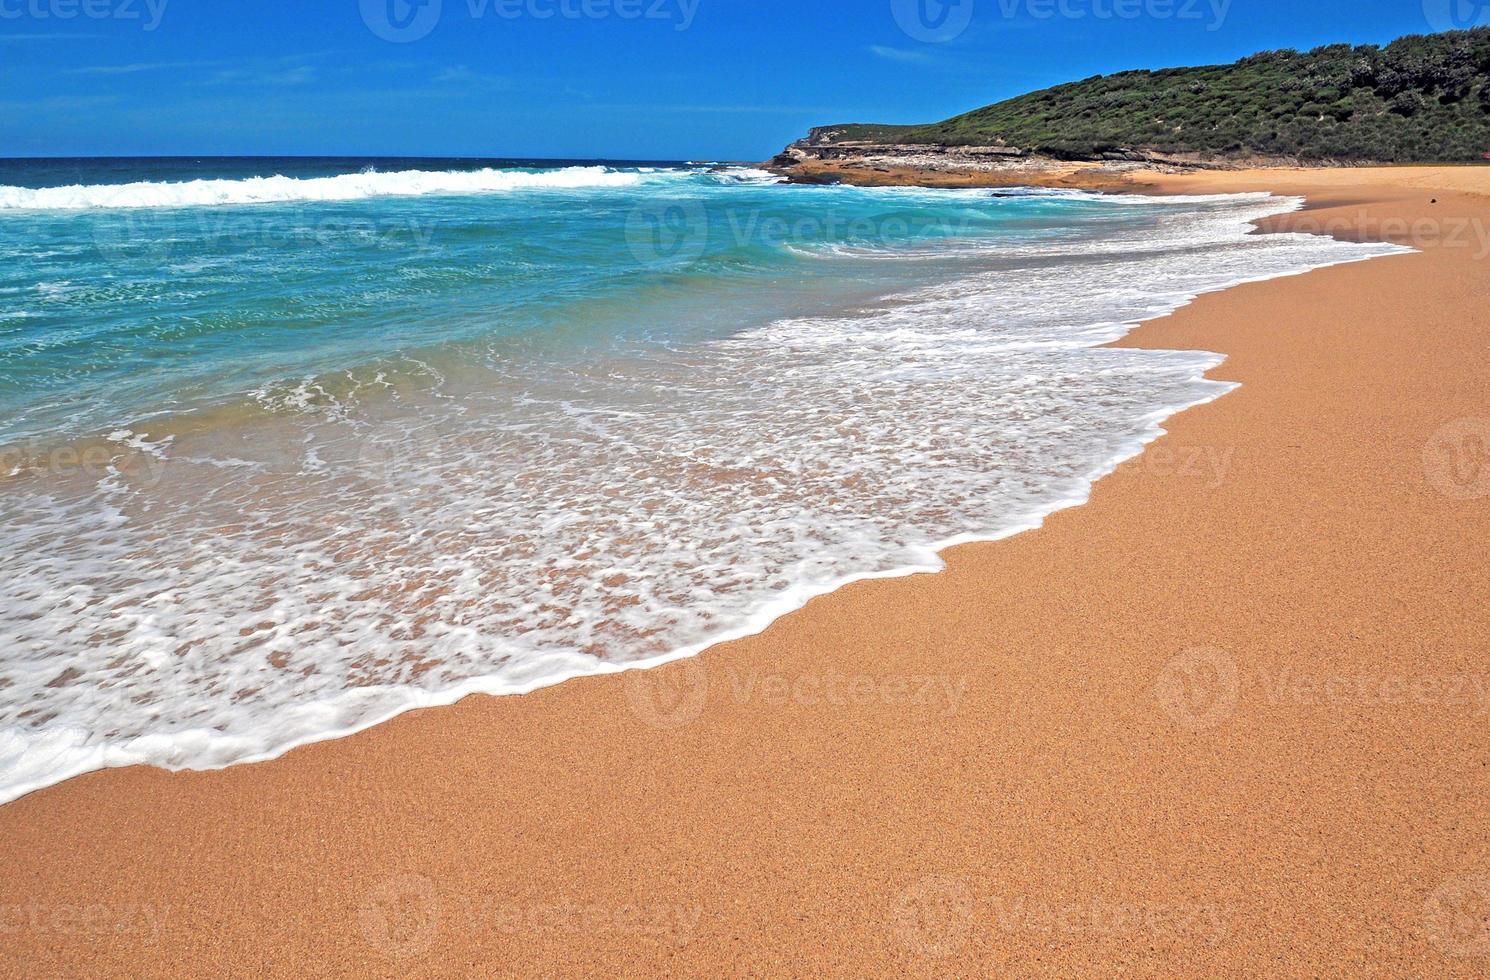 Isolated Pristine Beach near Sydney, NSW Australia photo